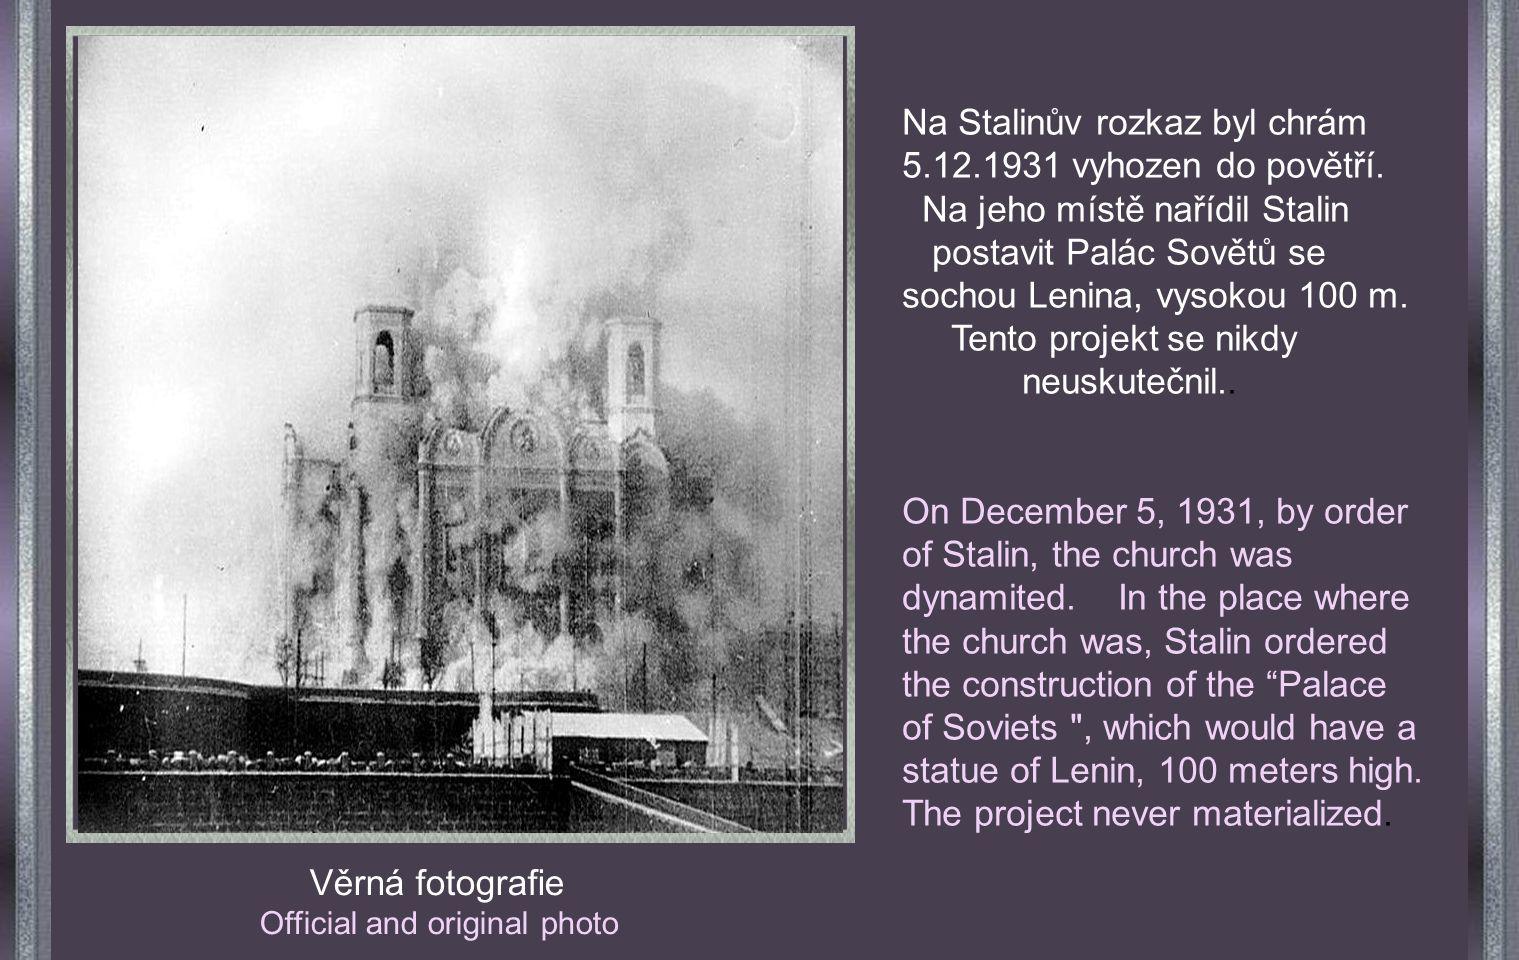 Stavba trvala 44 roků. Byl otevřen 20.5.1883 v den korunovace cara Alexandra III. The construction stayed on 44 years and in 1883, May 20, day of the